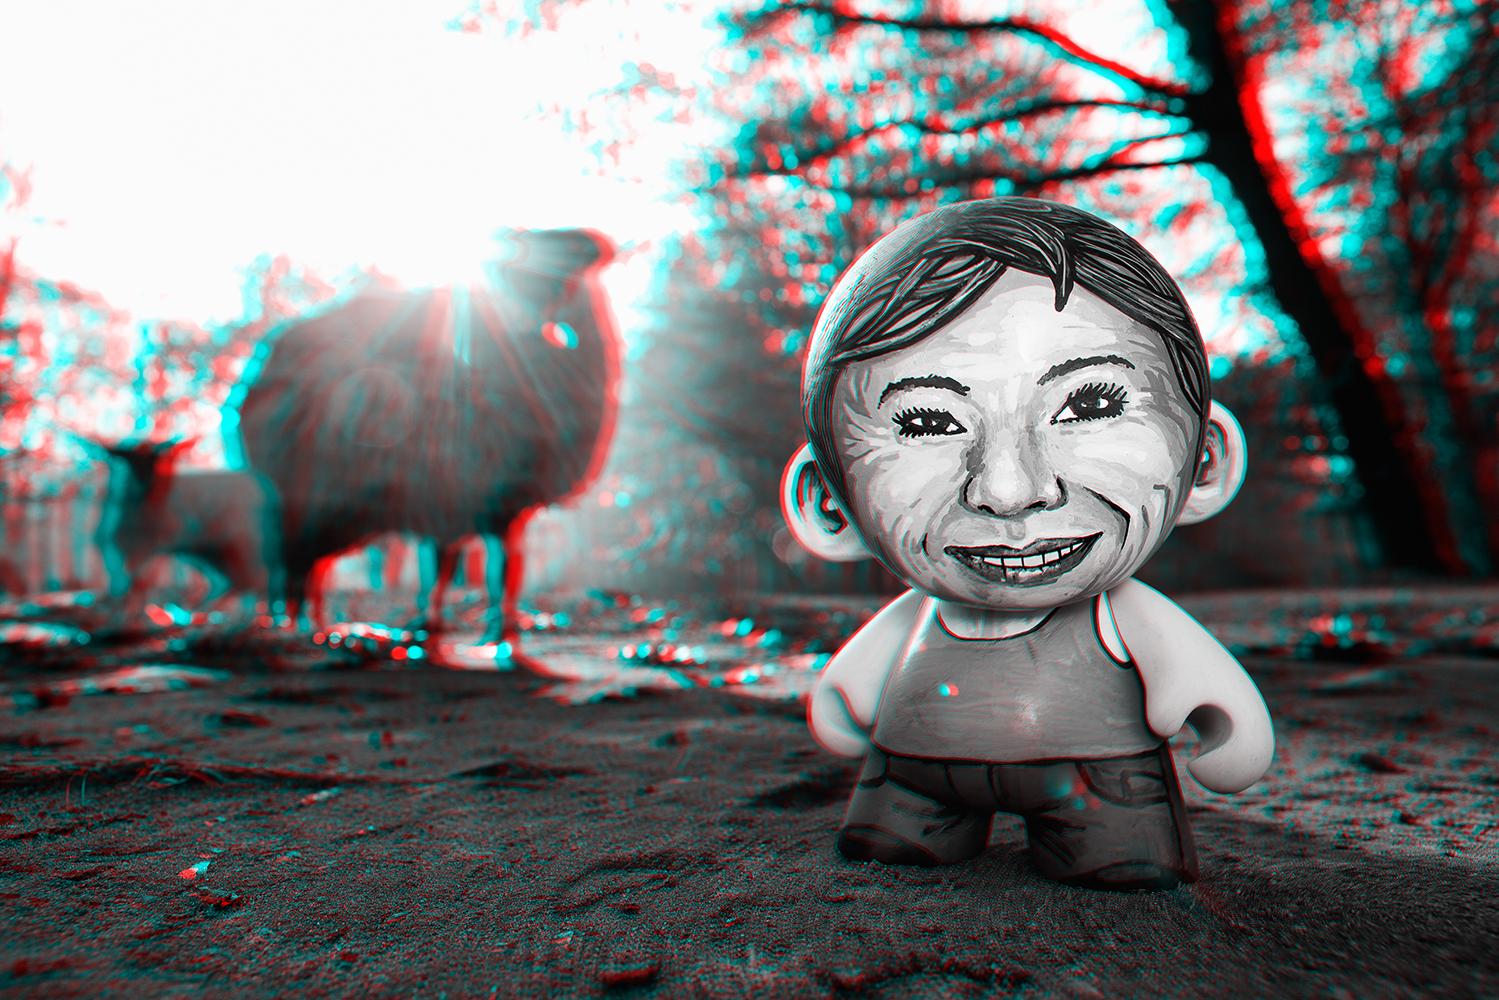 Birit_FINAL_OWL